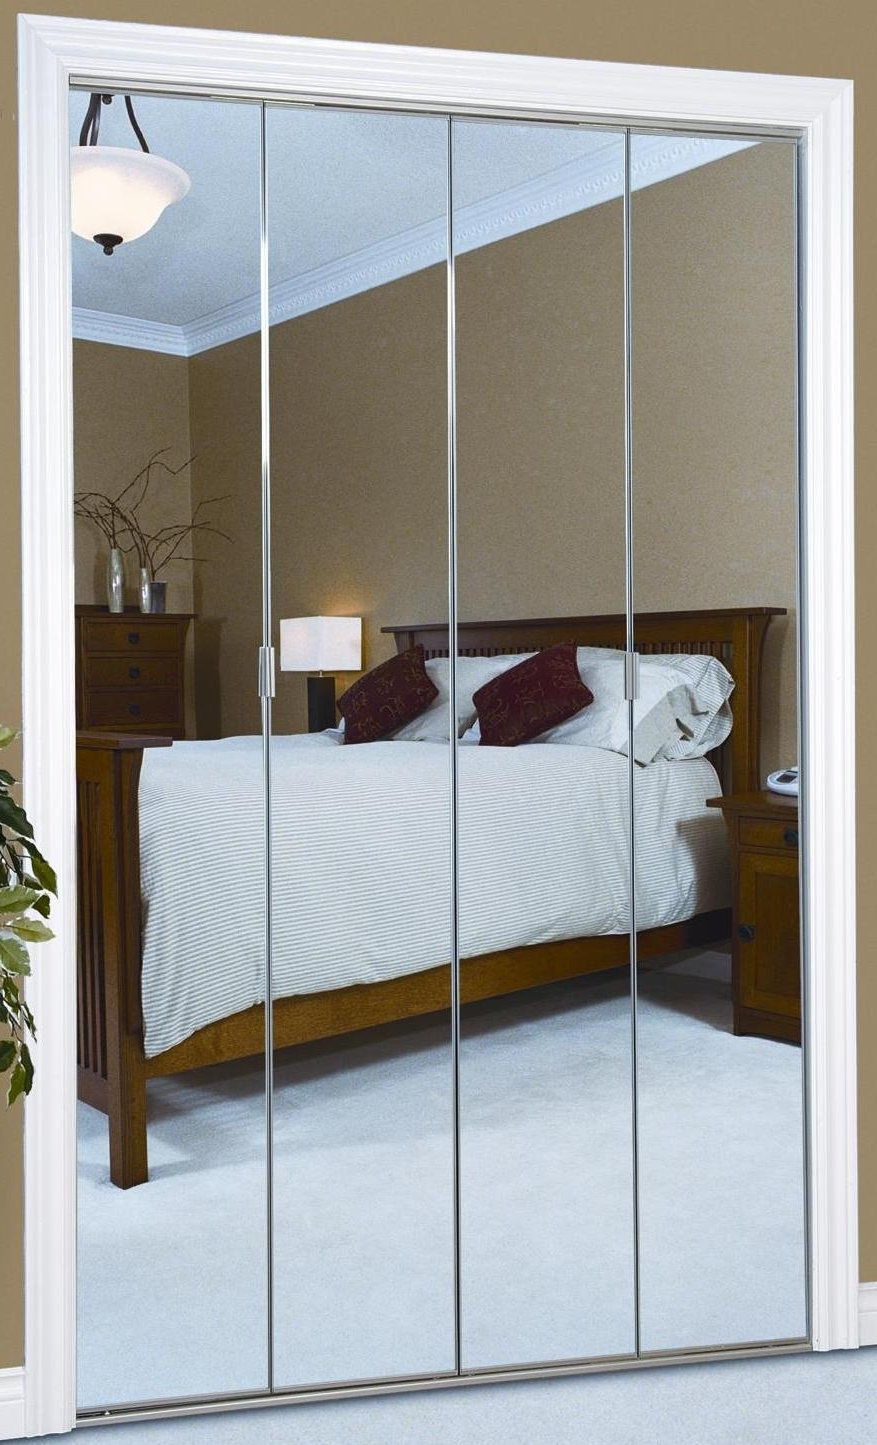 Folding Door Wardrobes With Famous Bi Fold Door System Upto 1200mm Wide (View 11 of 15)